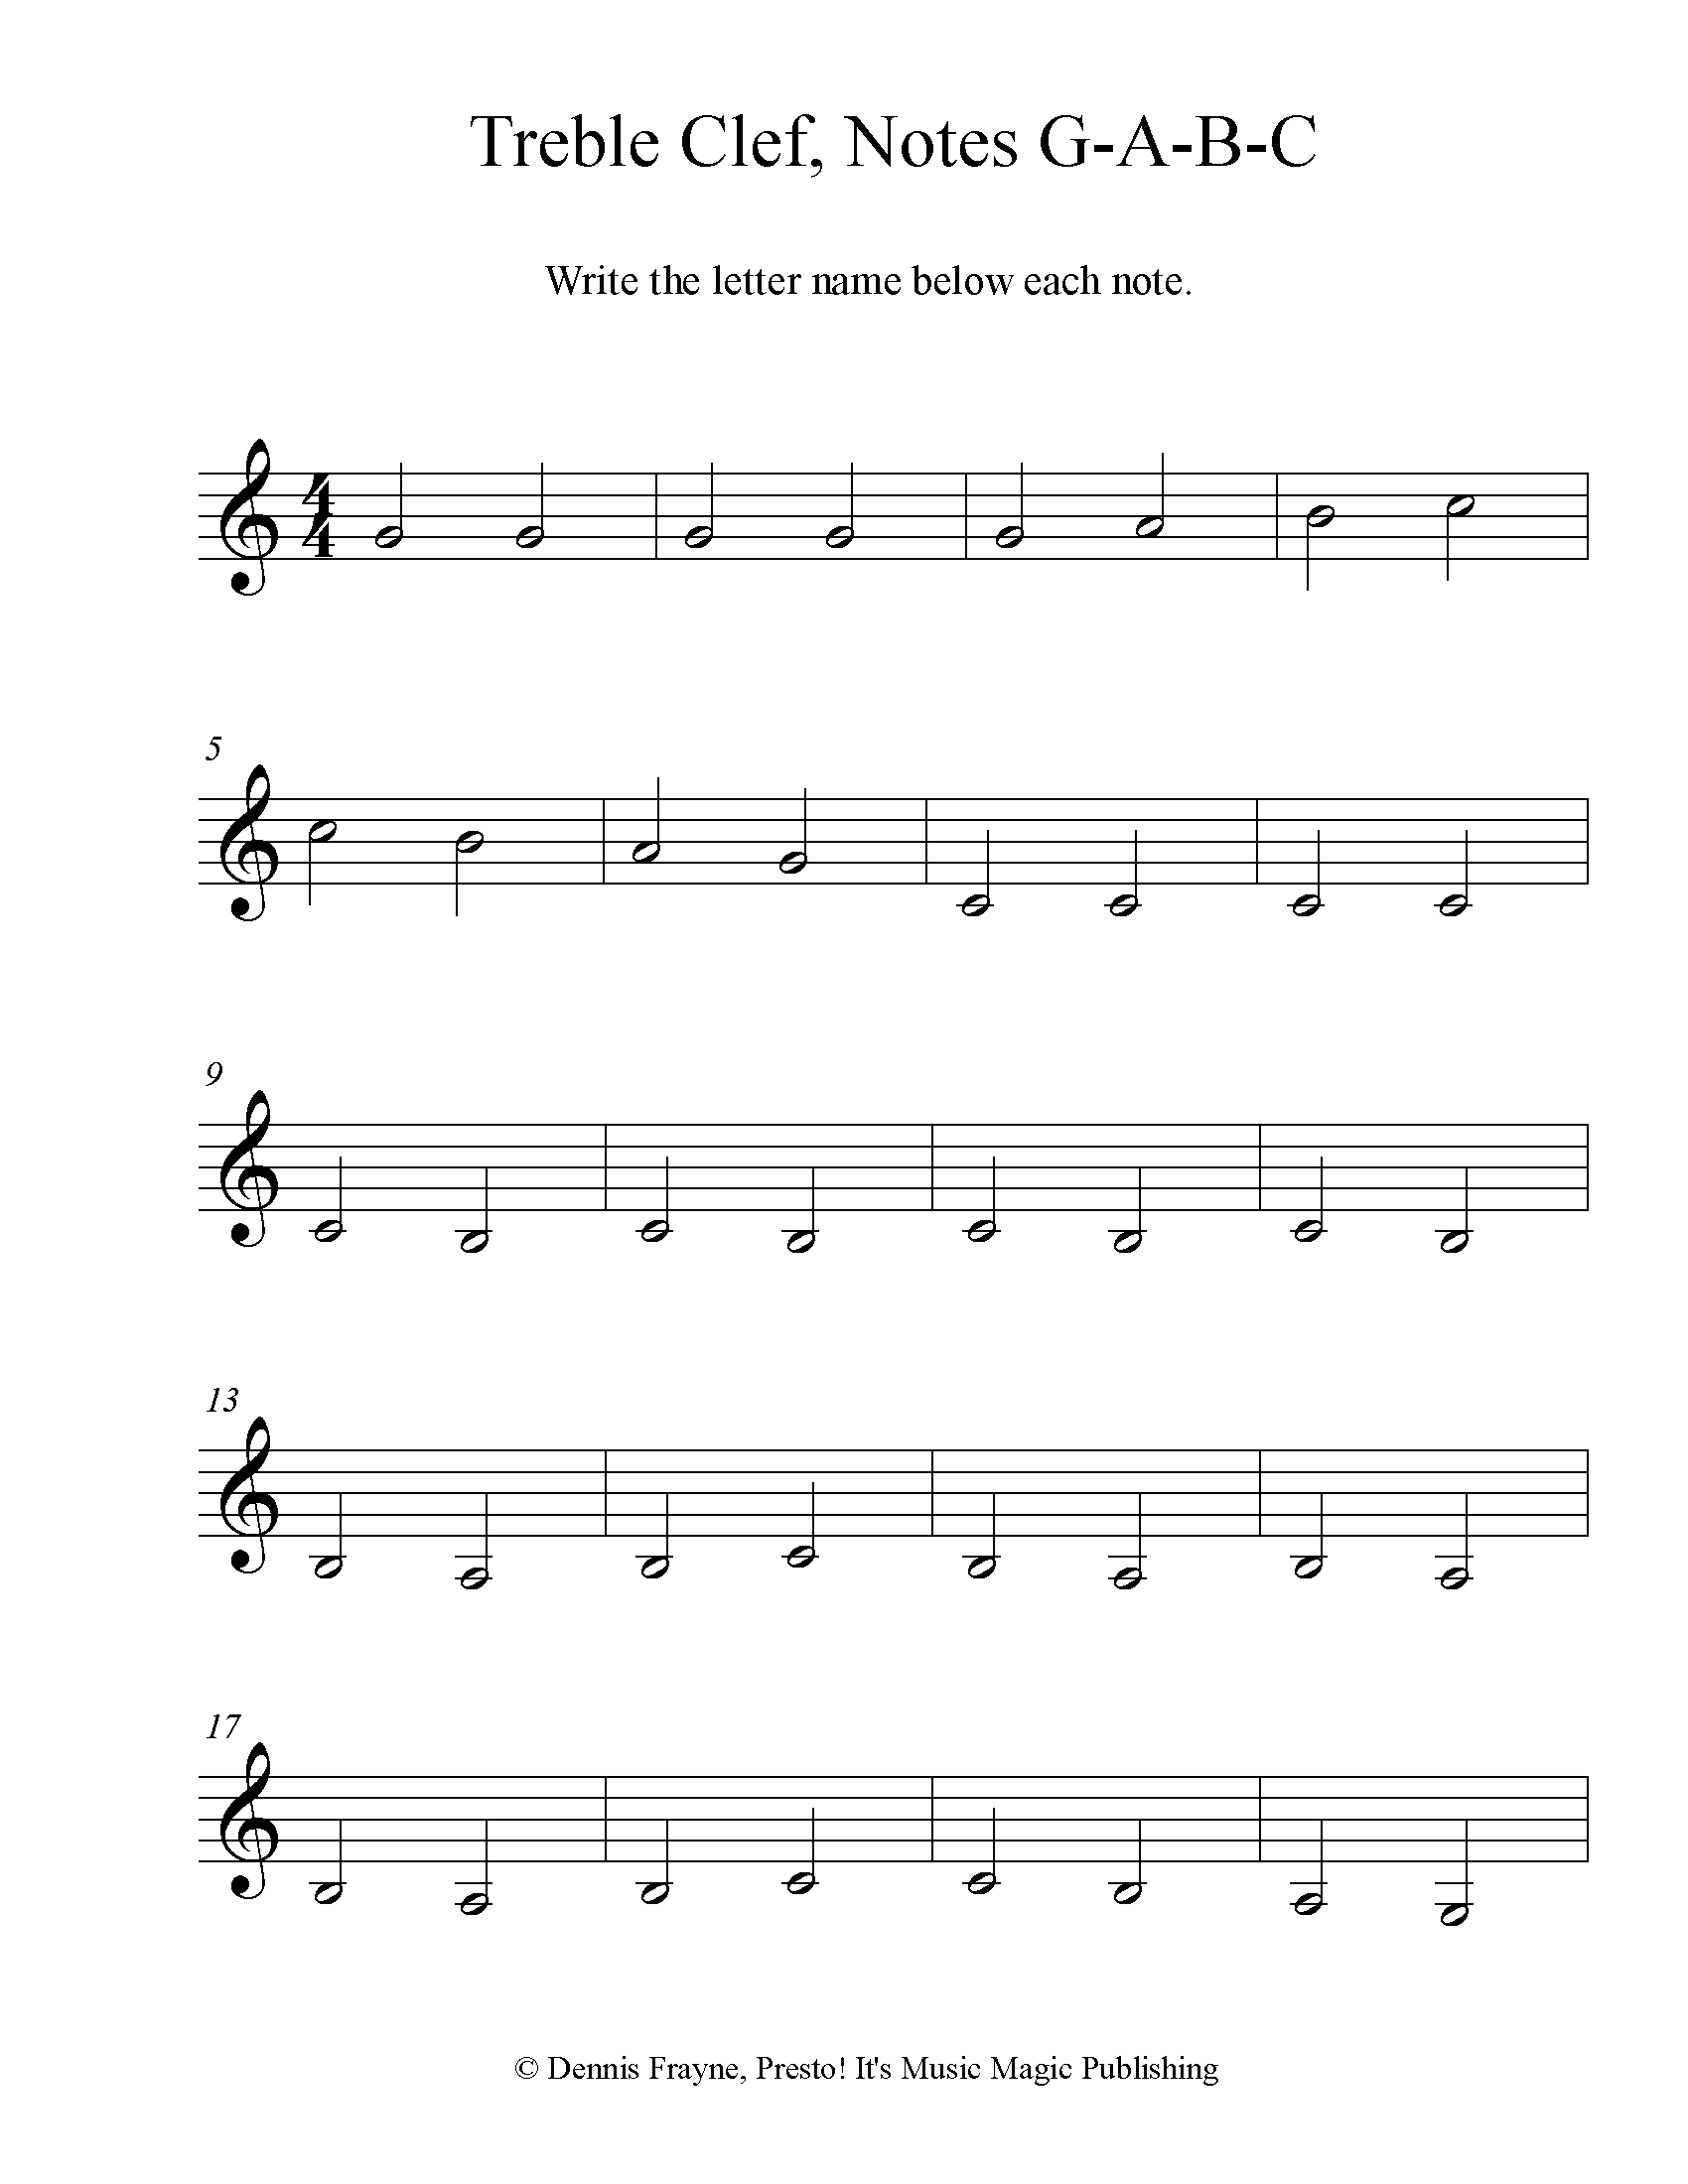 - FREE! Printable Music Note Naming Worksheets — Presto! It's Music